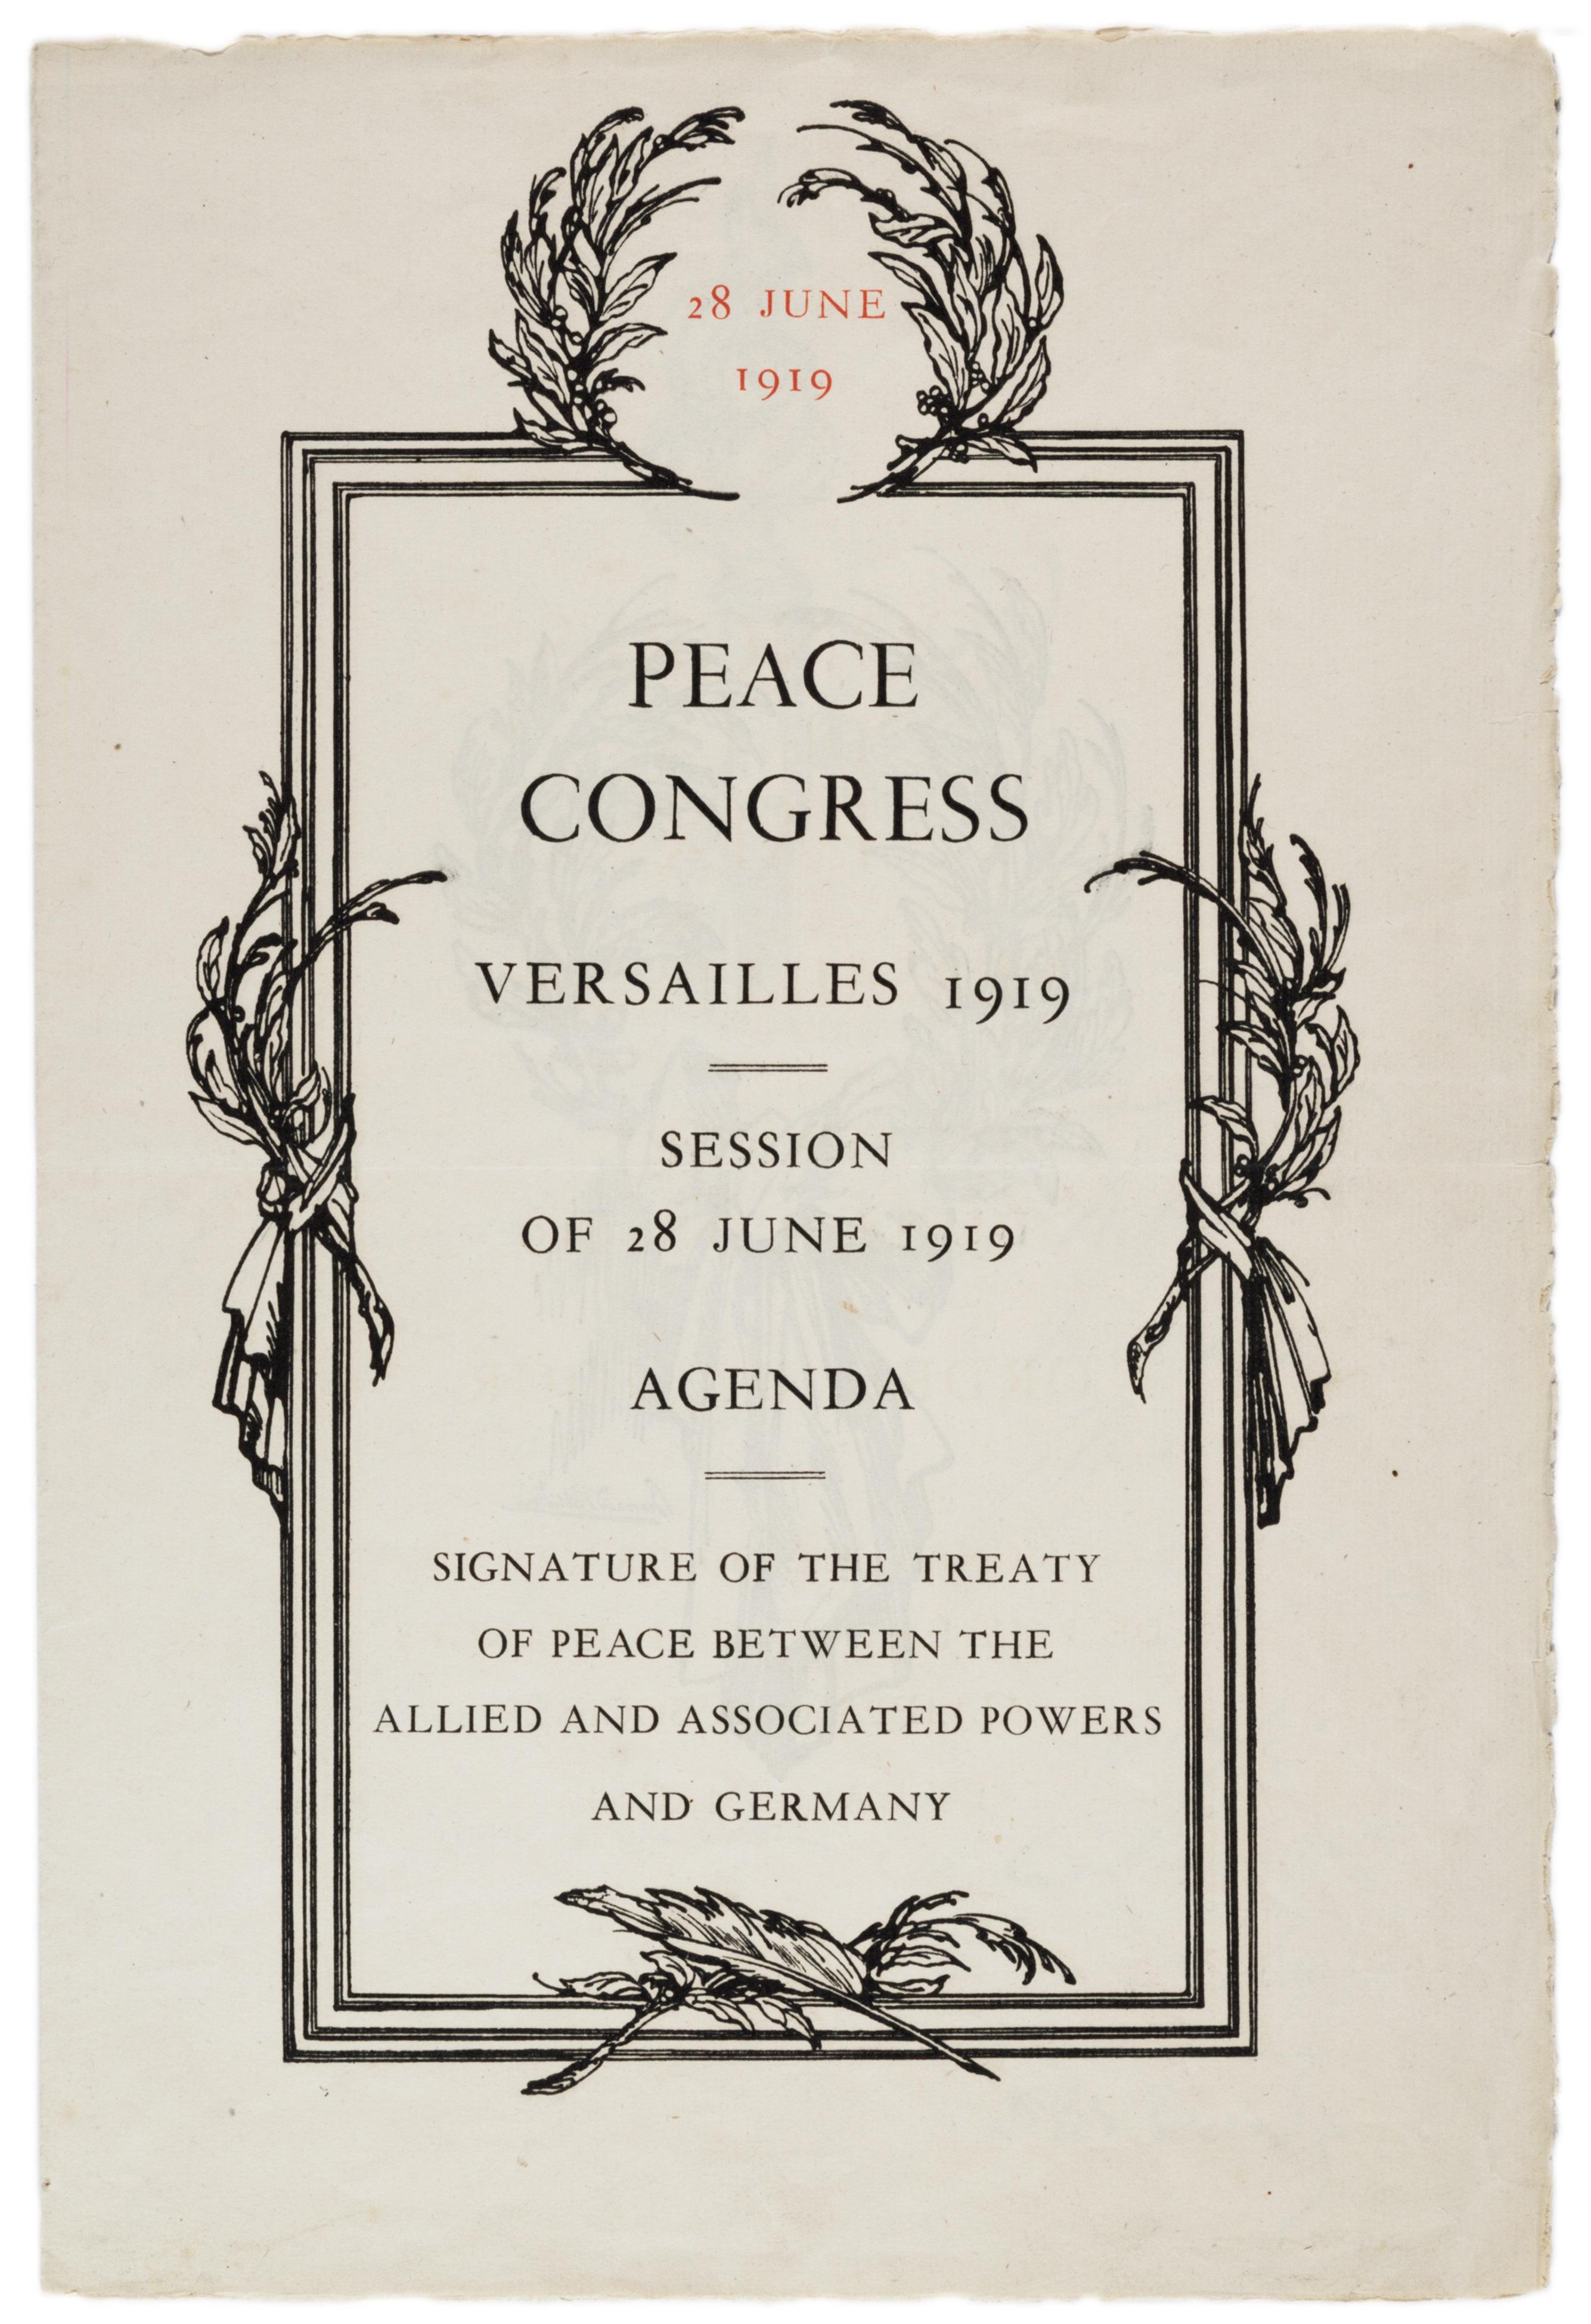 Peace Congress, Versailles 1919, Session of 28 June 1919: Agenda (GLC00752)